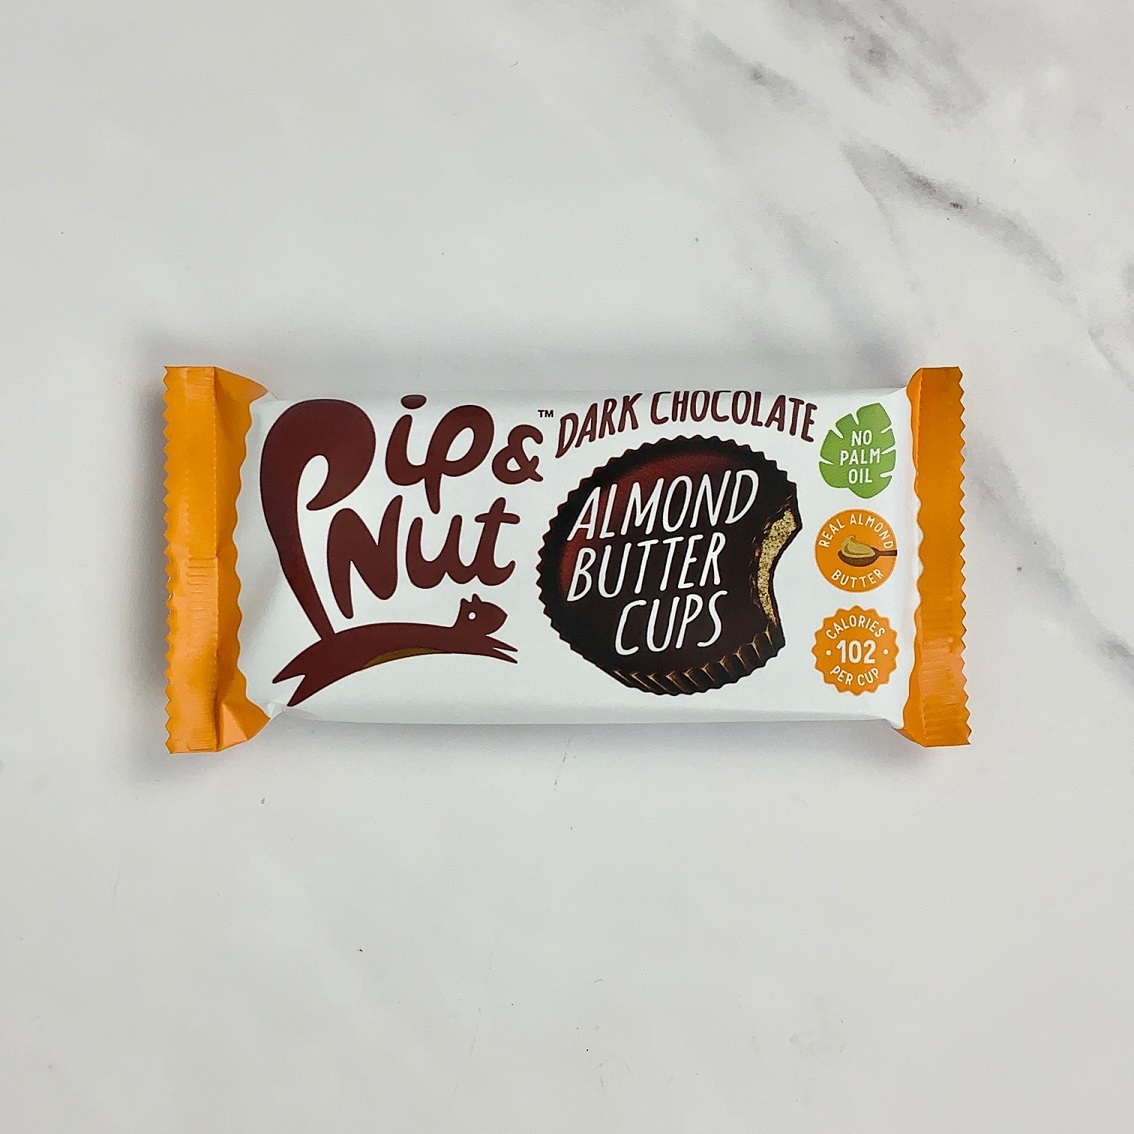 Pip & Nut Dark Chocolate Almond Butter Cups – 15 x 34g